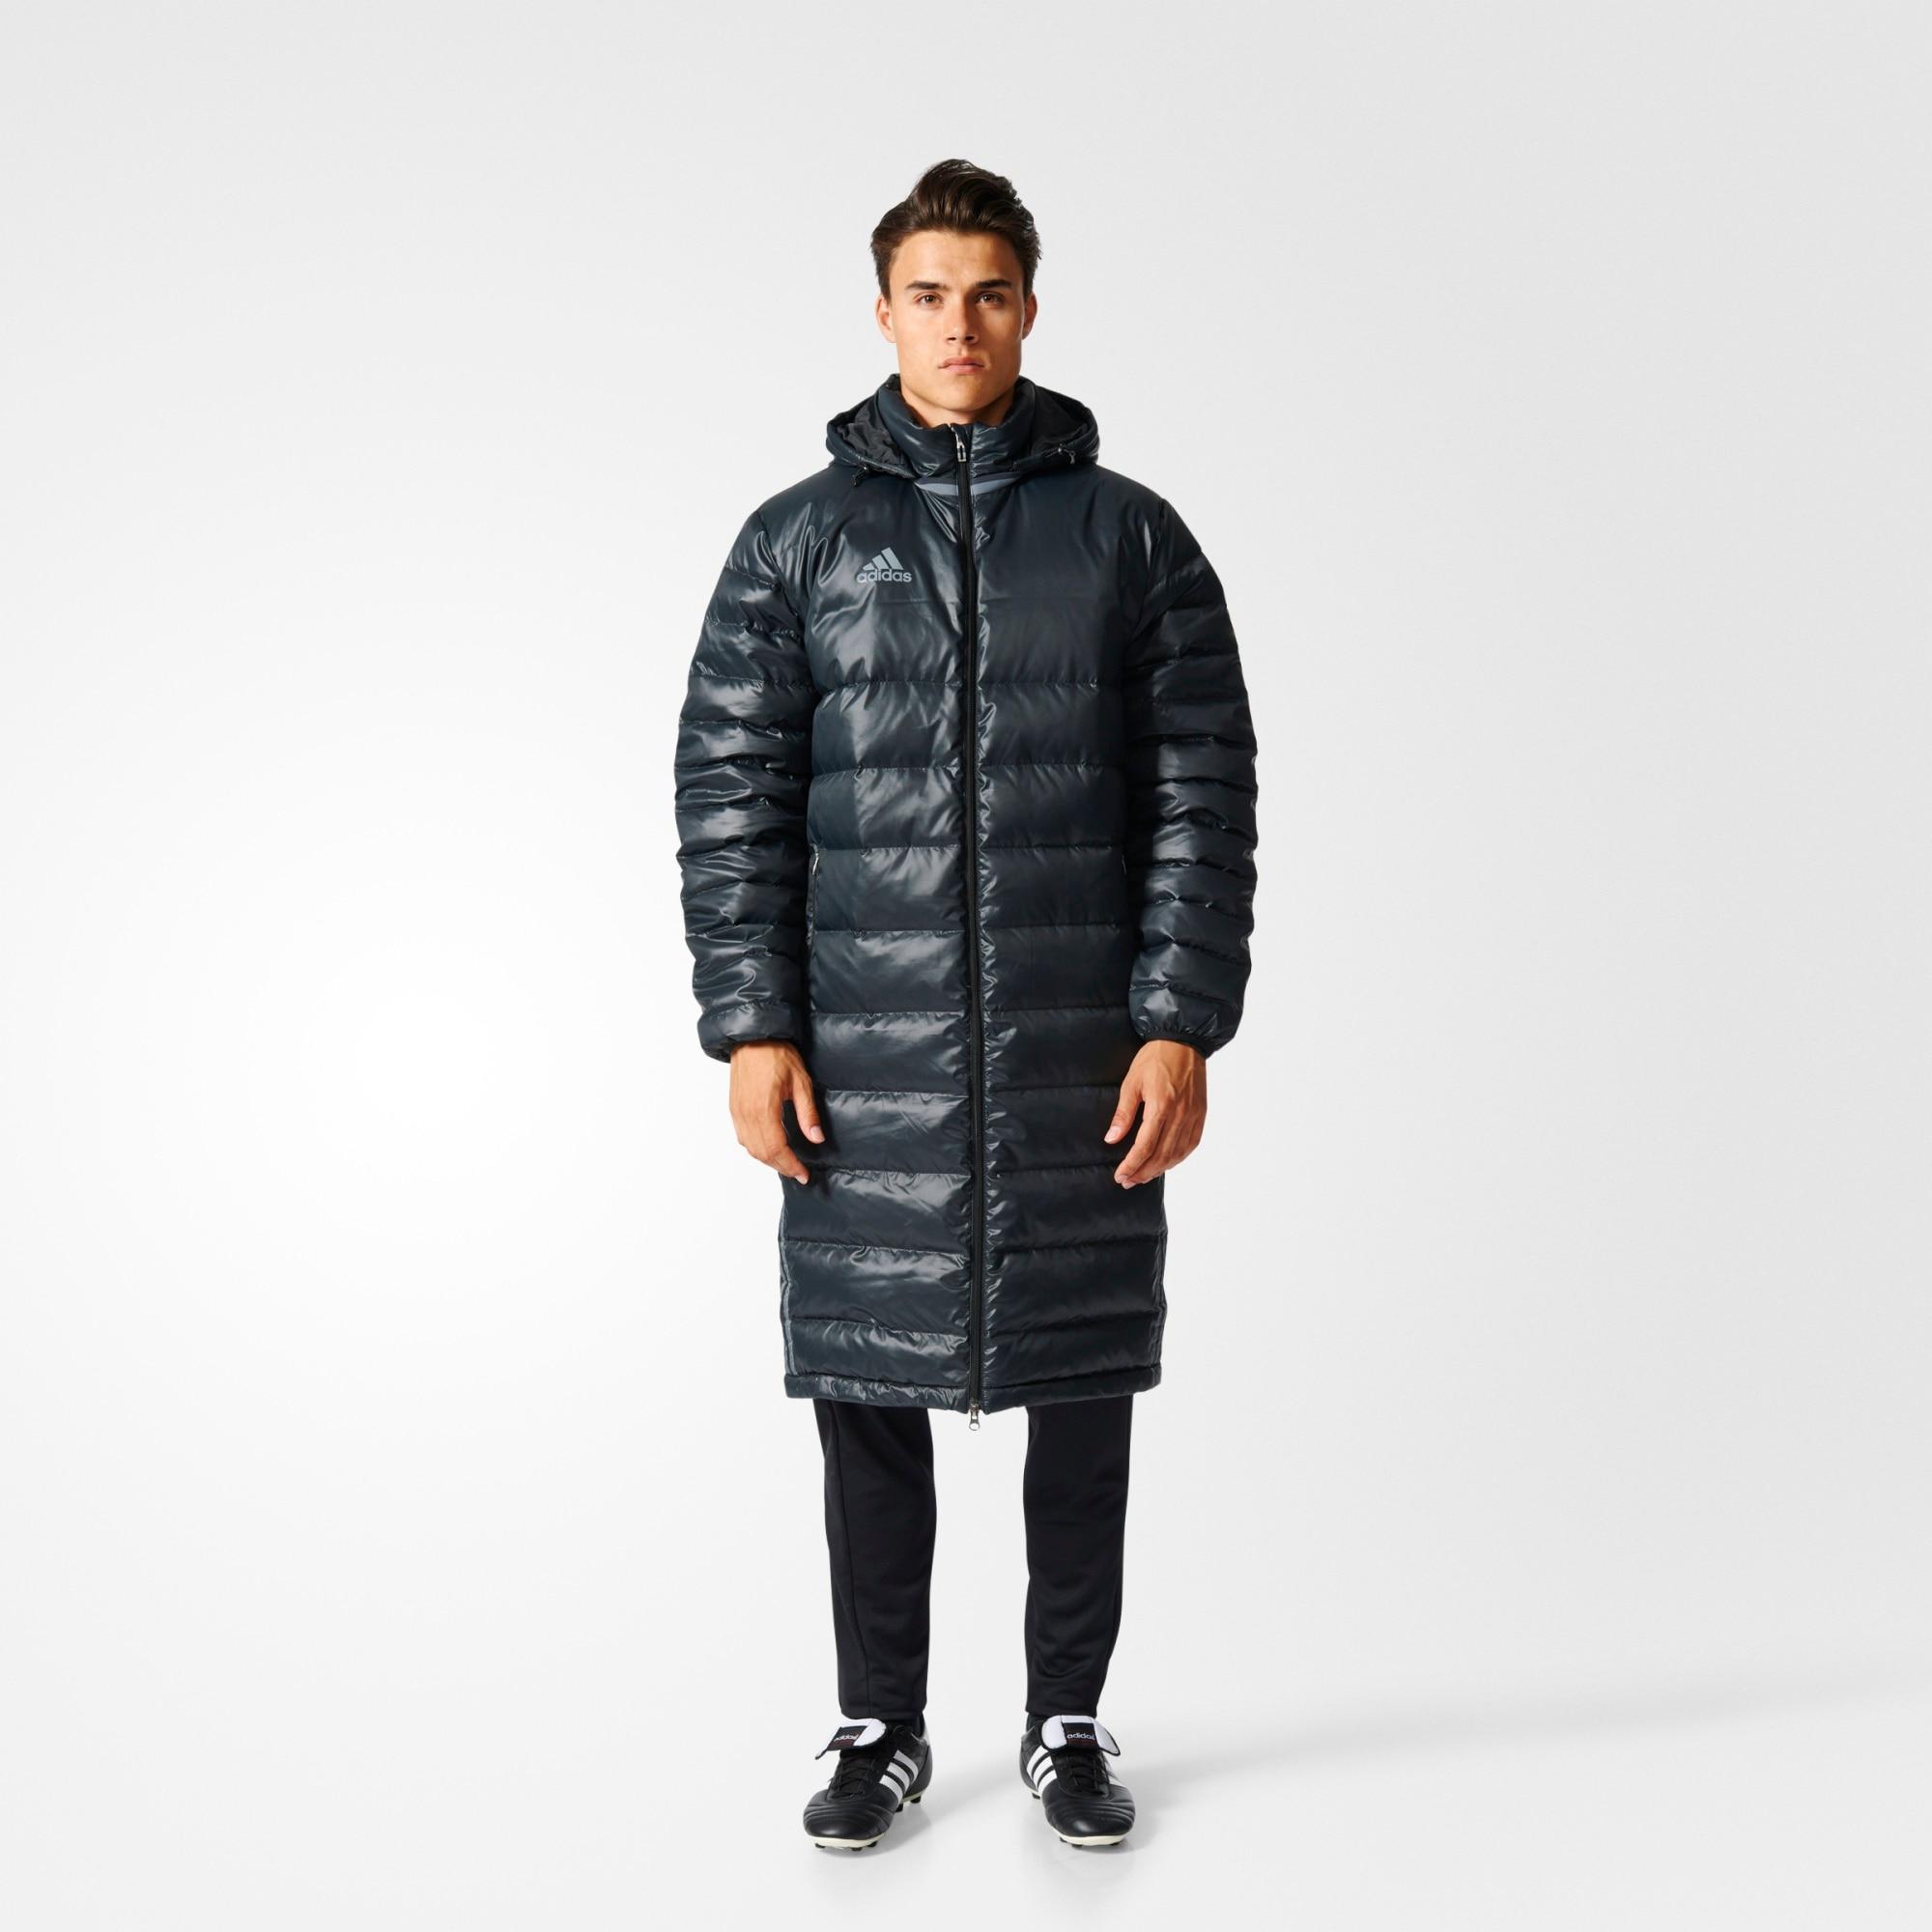 Adidas down jacket AX6458 adidas adizero track jacket